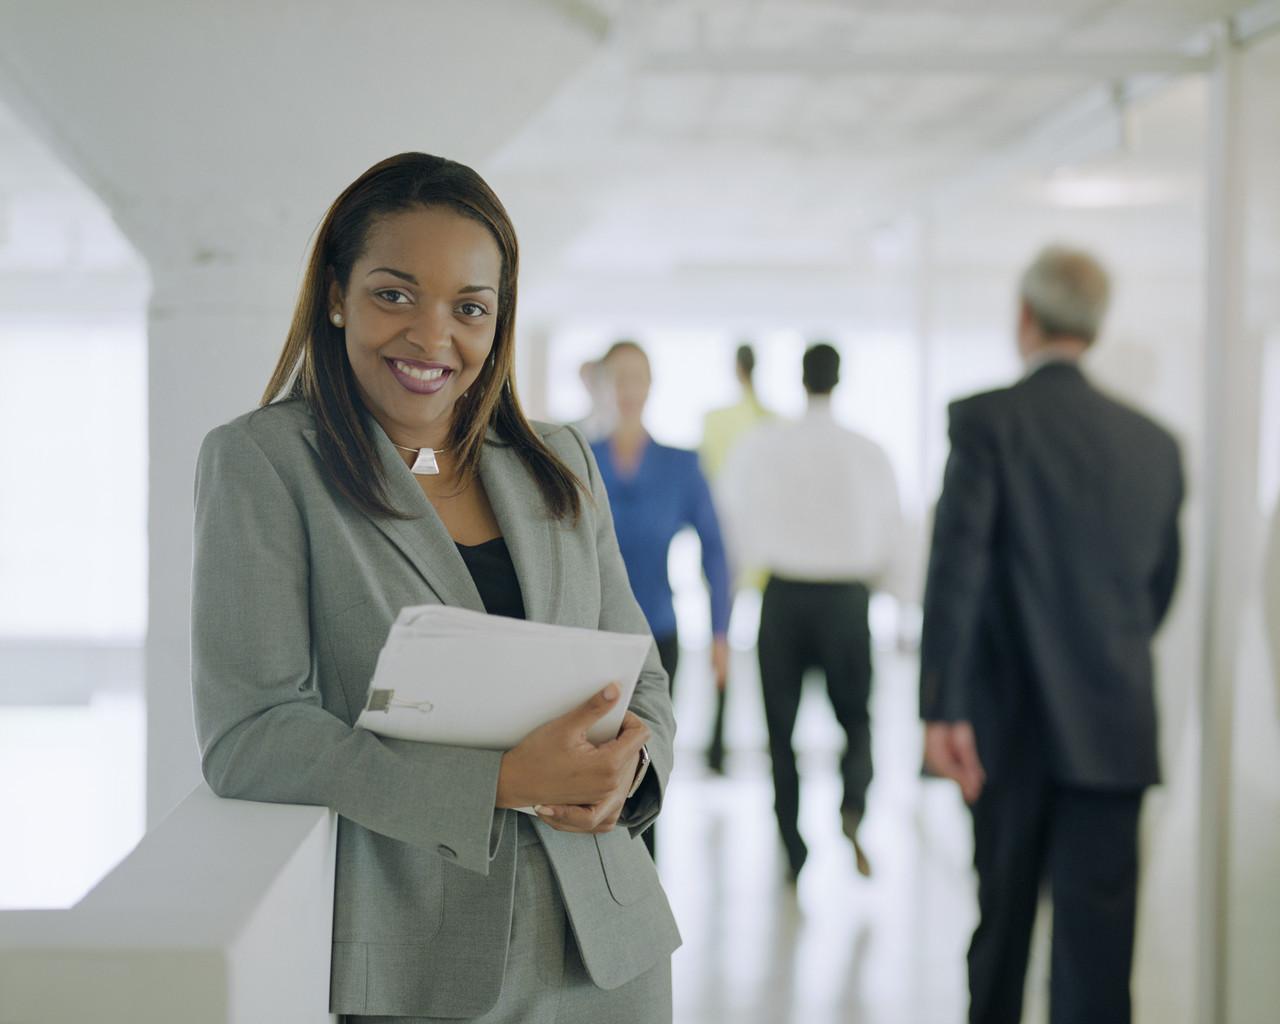 women entrepreneurs the secrets of success blog jack canfield s top 7 success tips